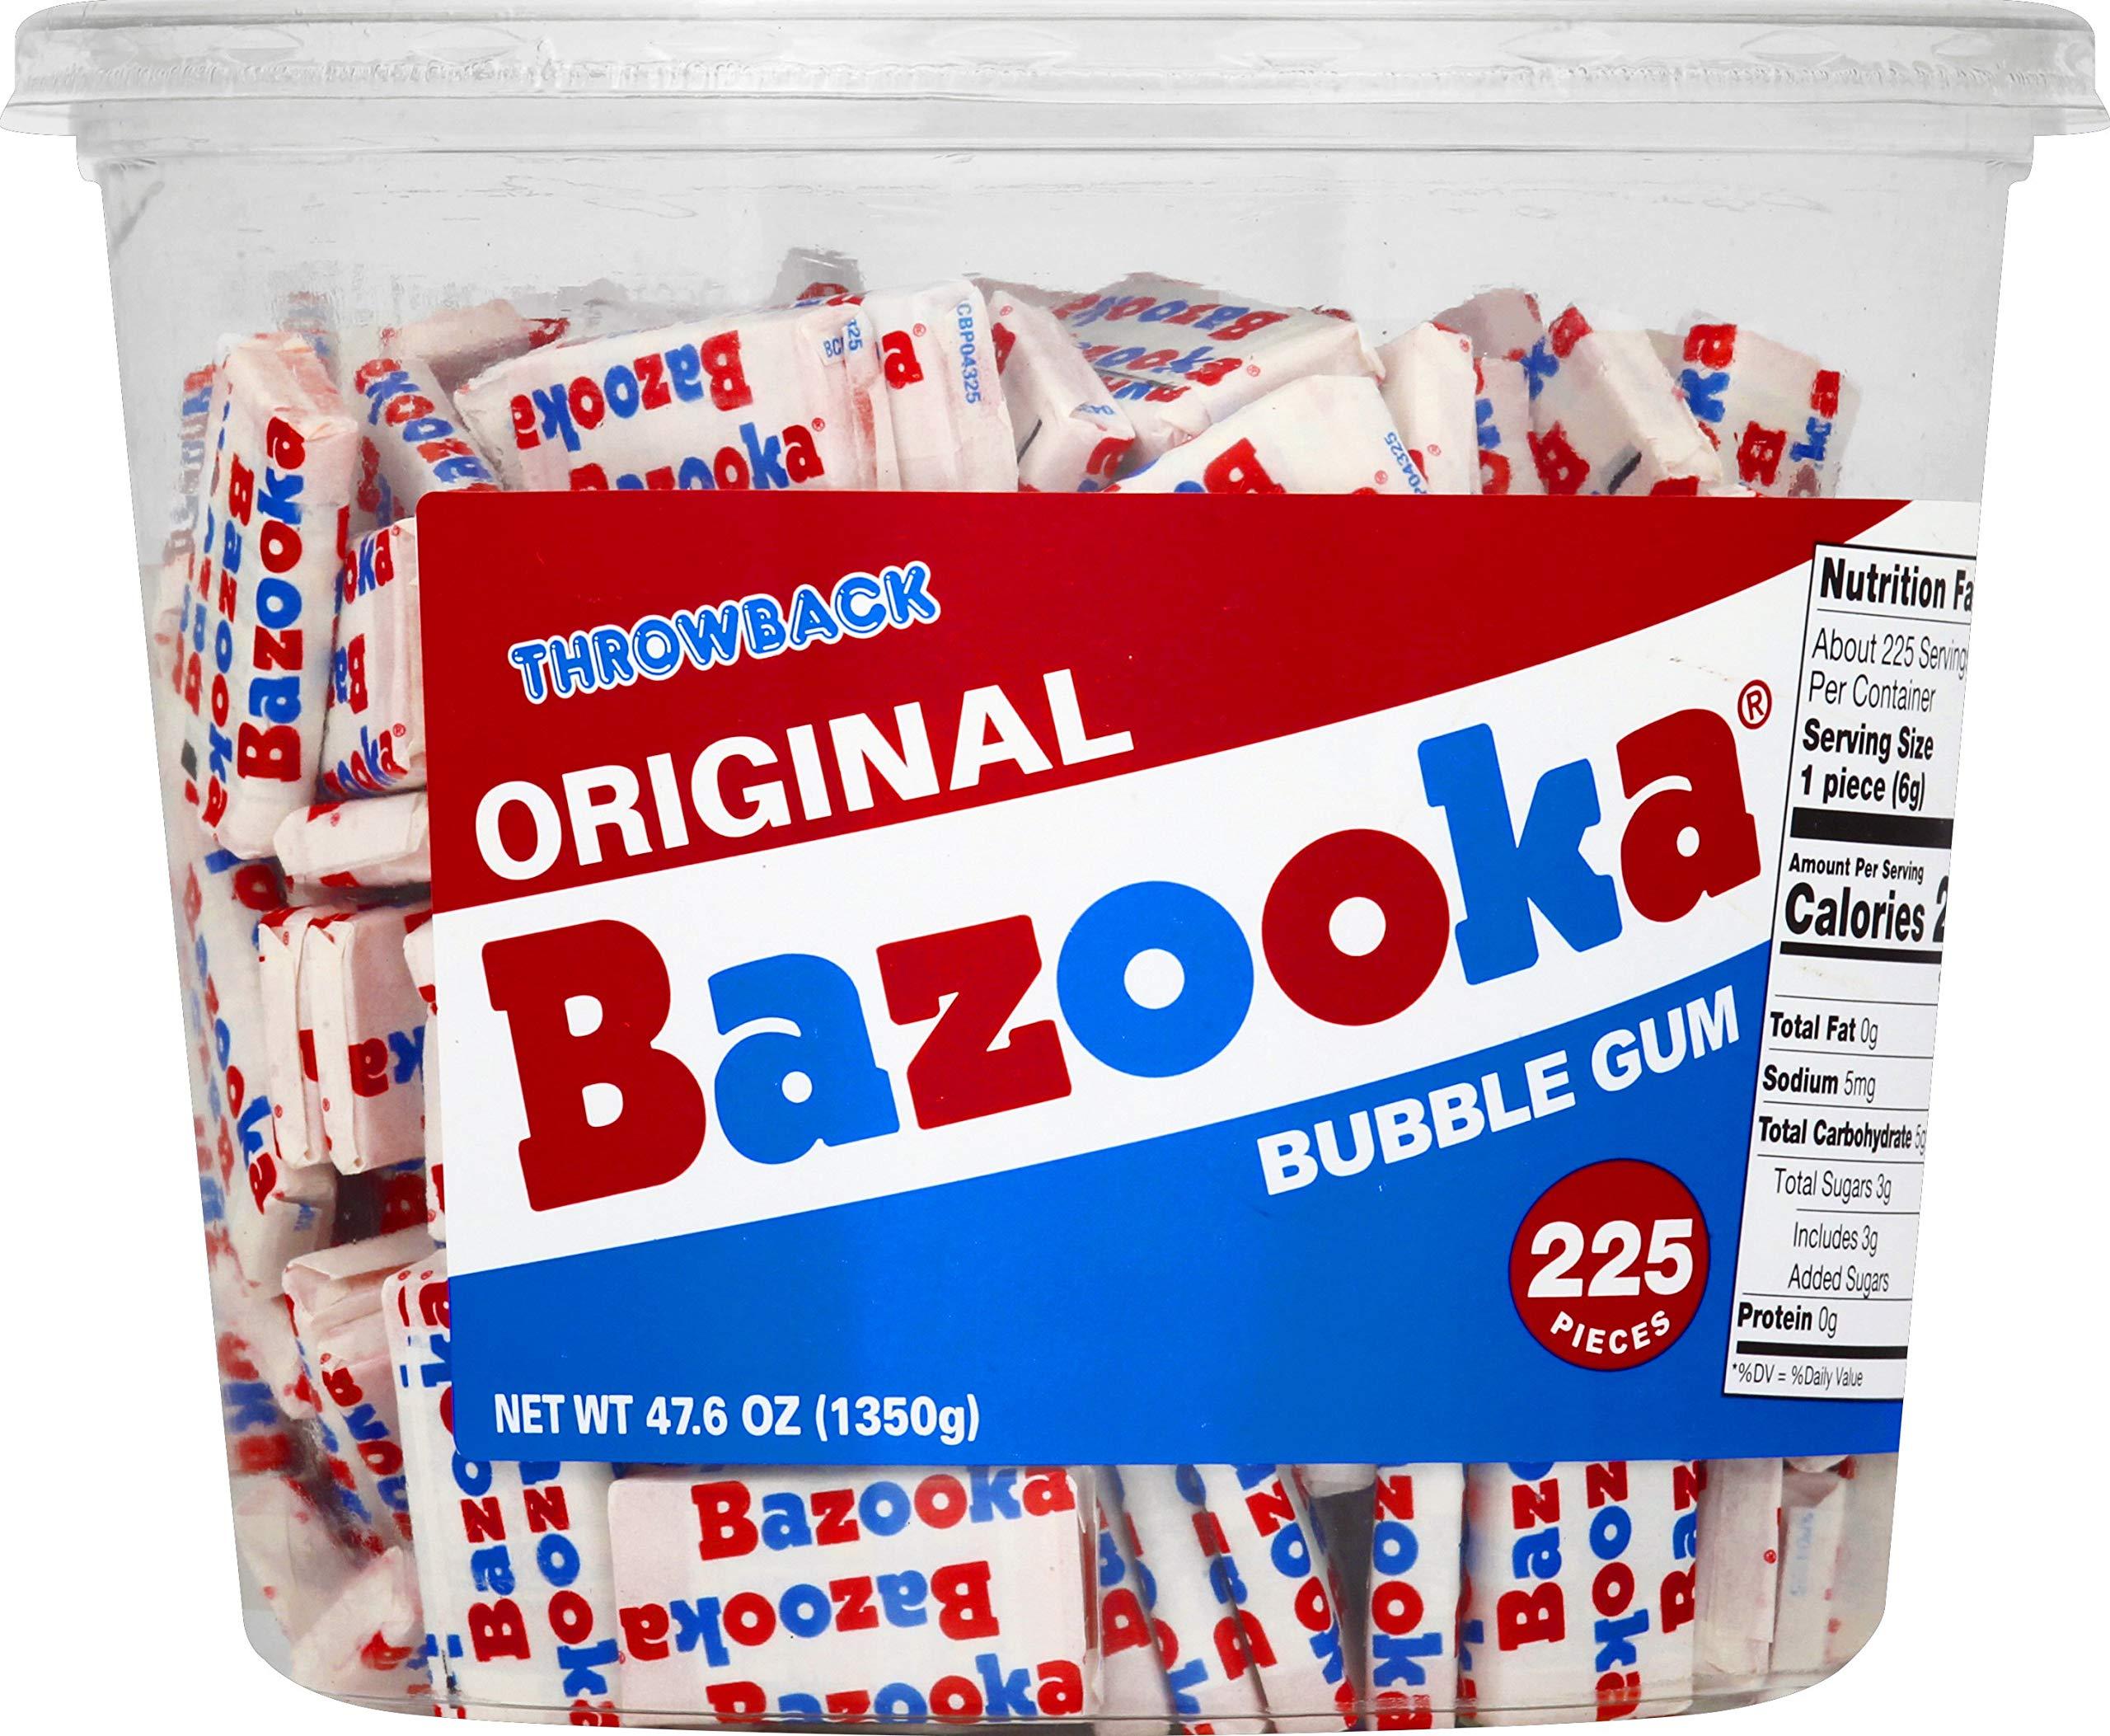 Bazooka Individually Wrapped Nostalgia Bubble Gum, Original Flavor, 225Count Halloween Bulk Tub by Bazooka